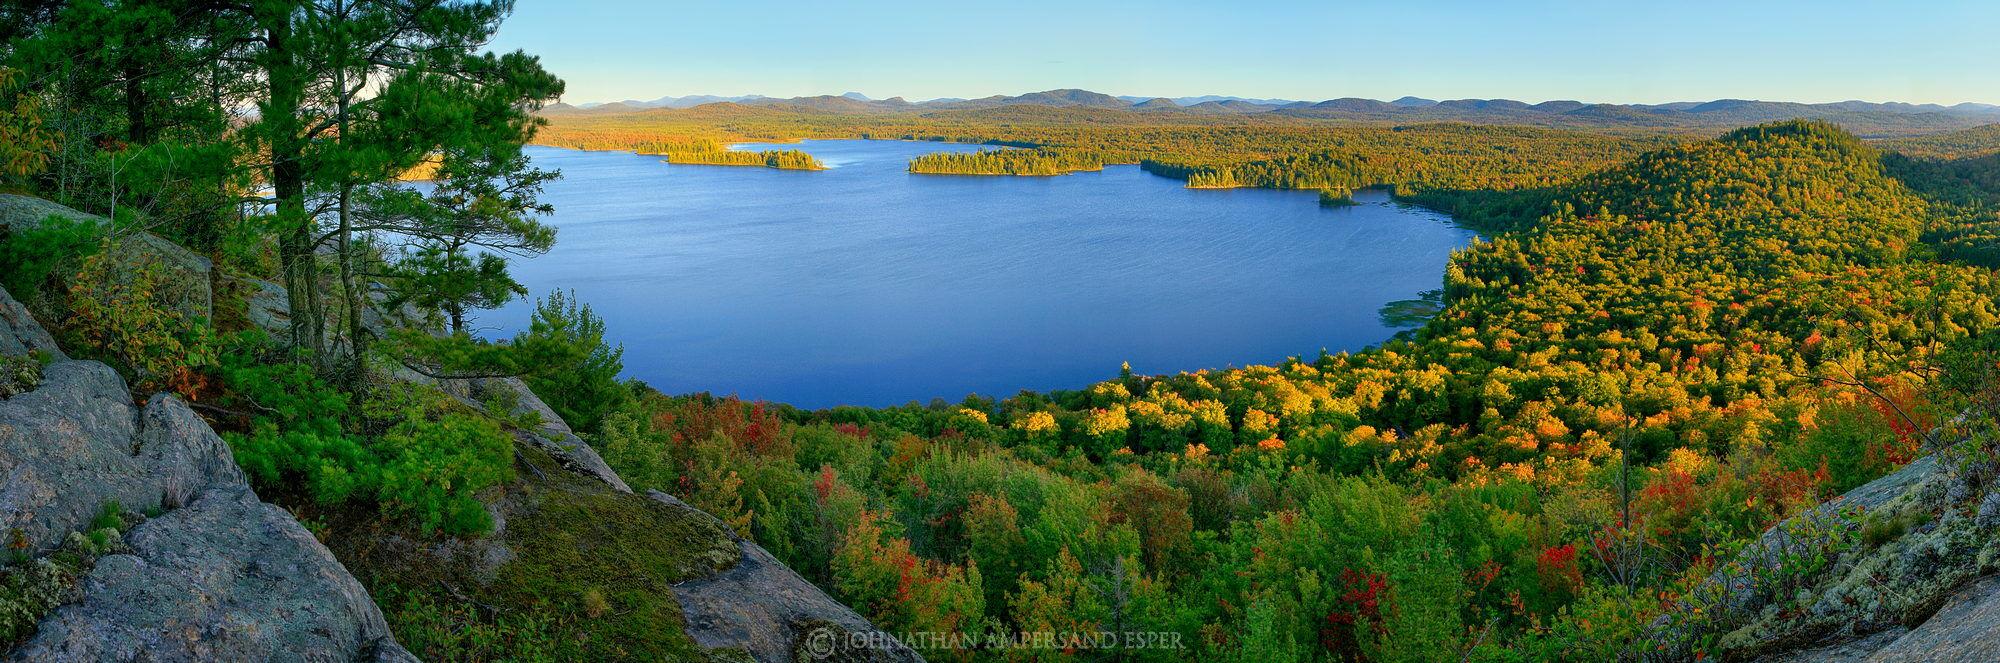 Lake Lila, Mt. Frederica, panorama, photo